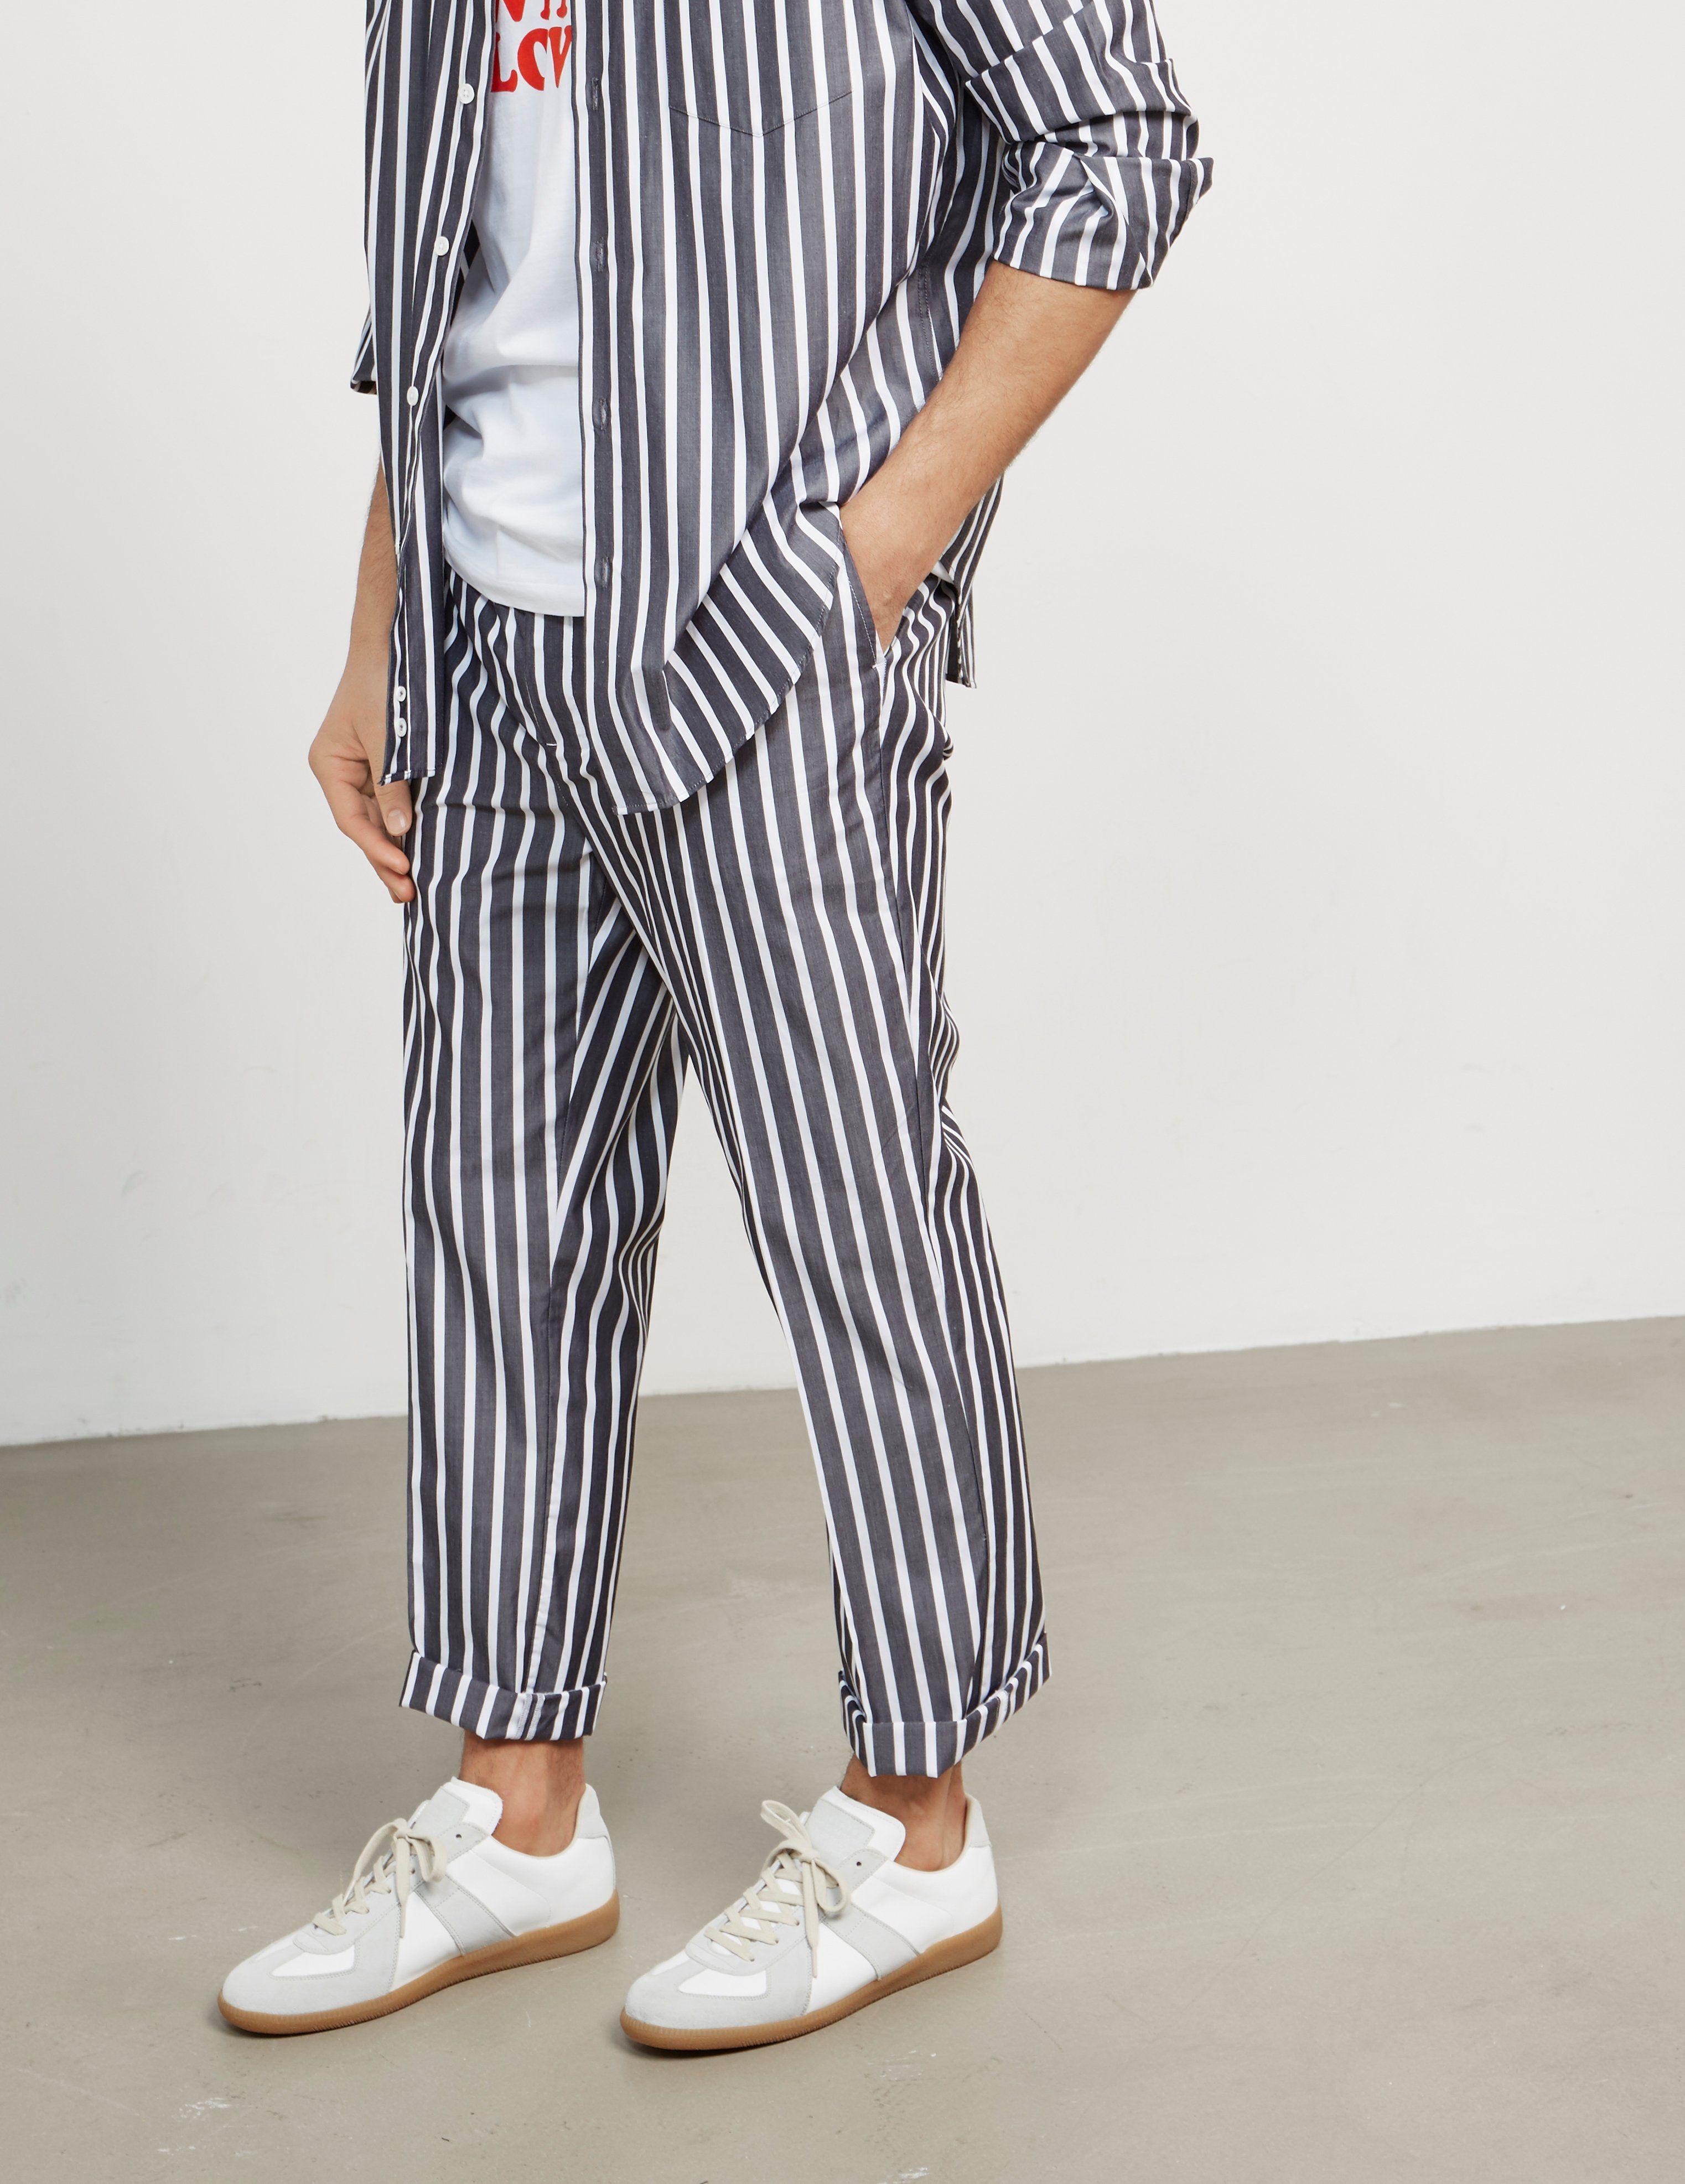 AMI Paris Striped Trousers - Online Exclusive